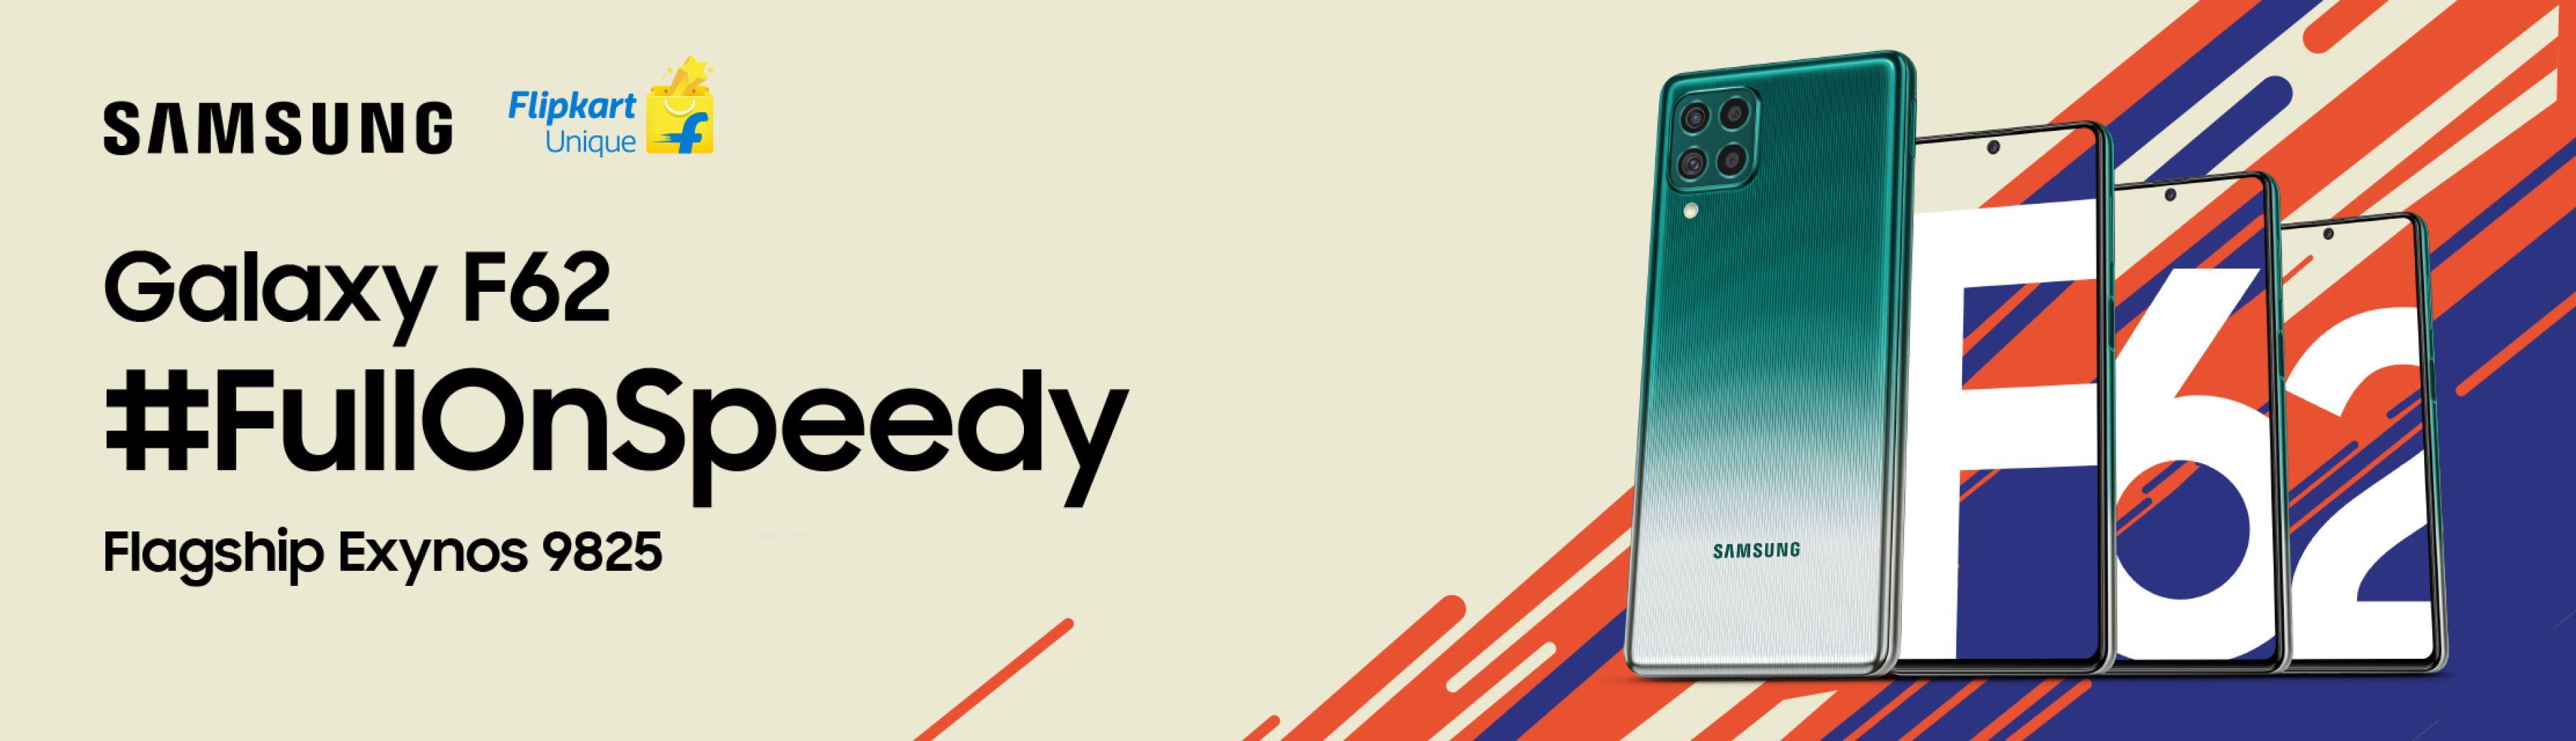 smartfon Samsung Galaxy F62 smartphone